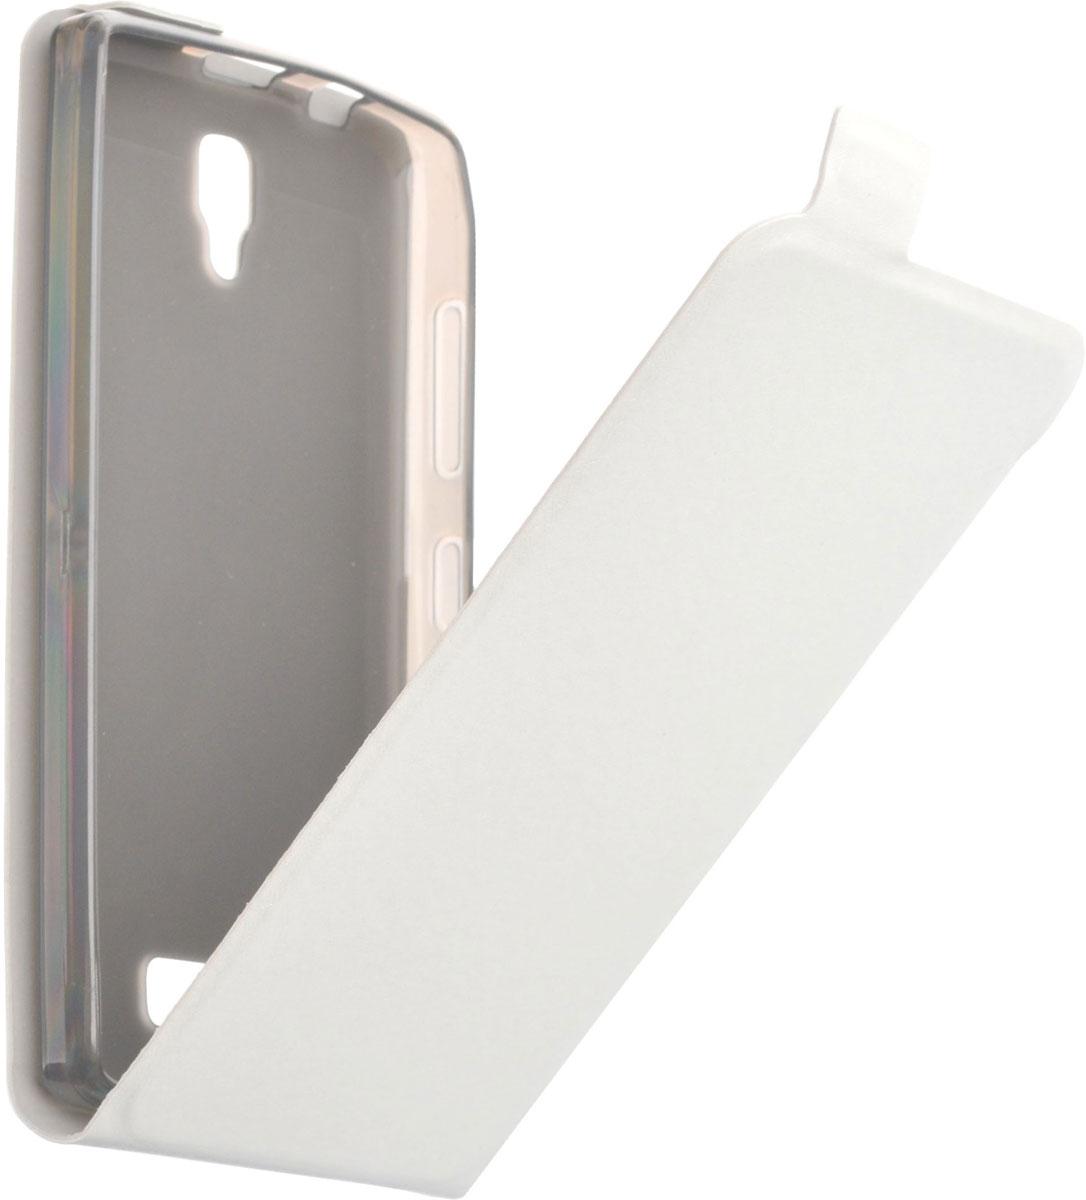 Skinbox Flip slimчехол для Lenovo A2010, White Skinbox